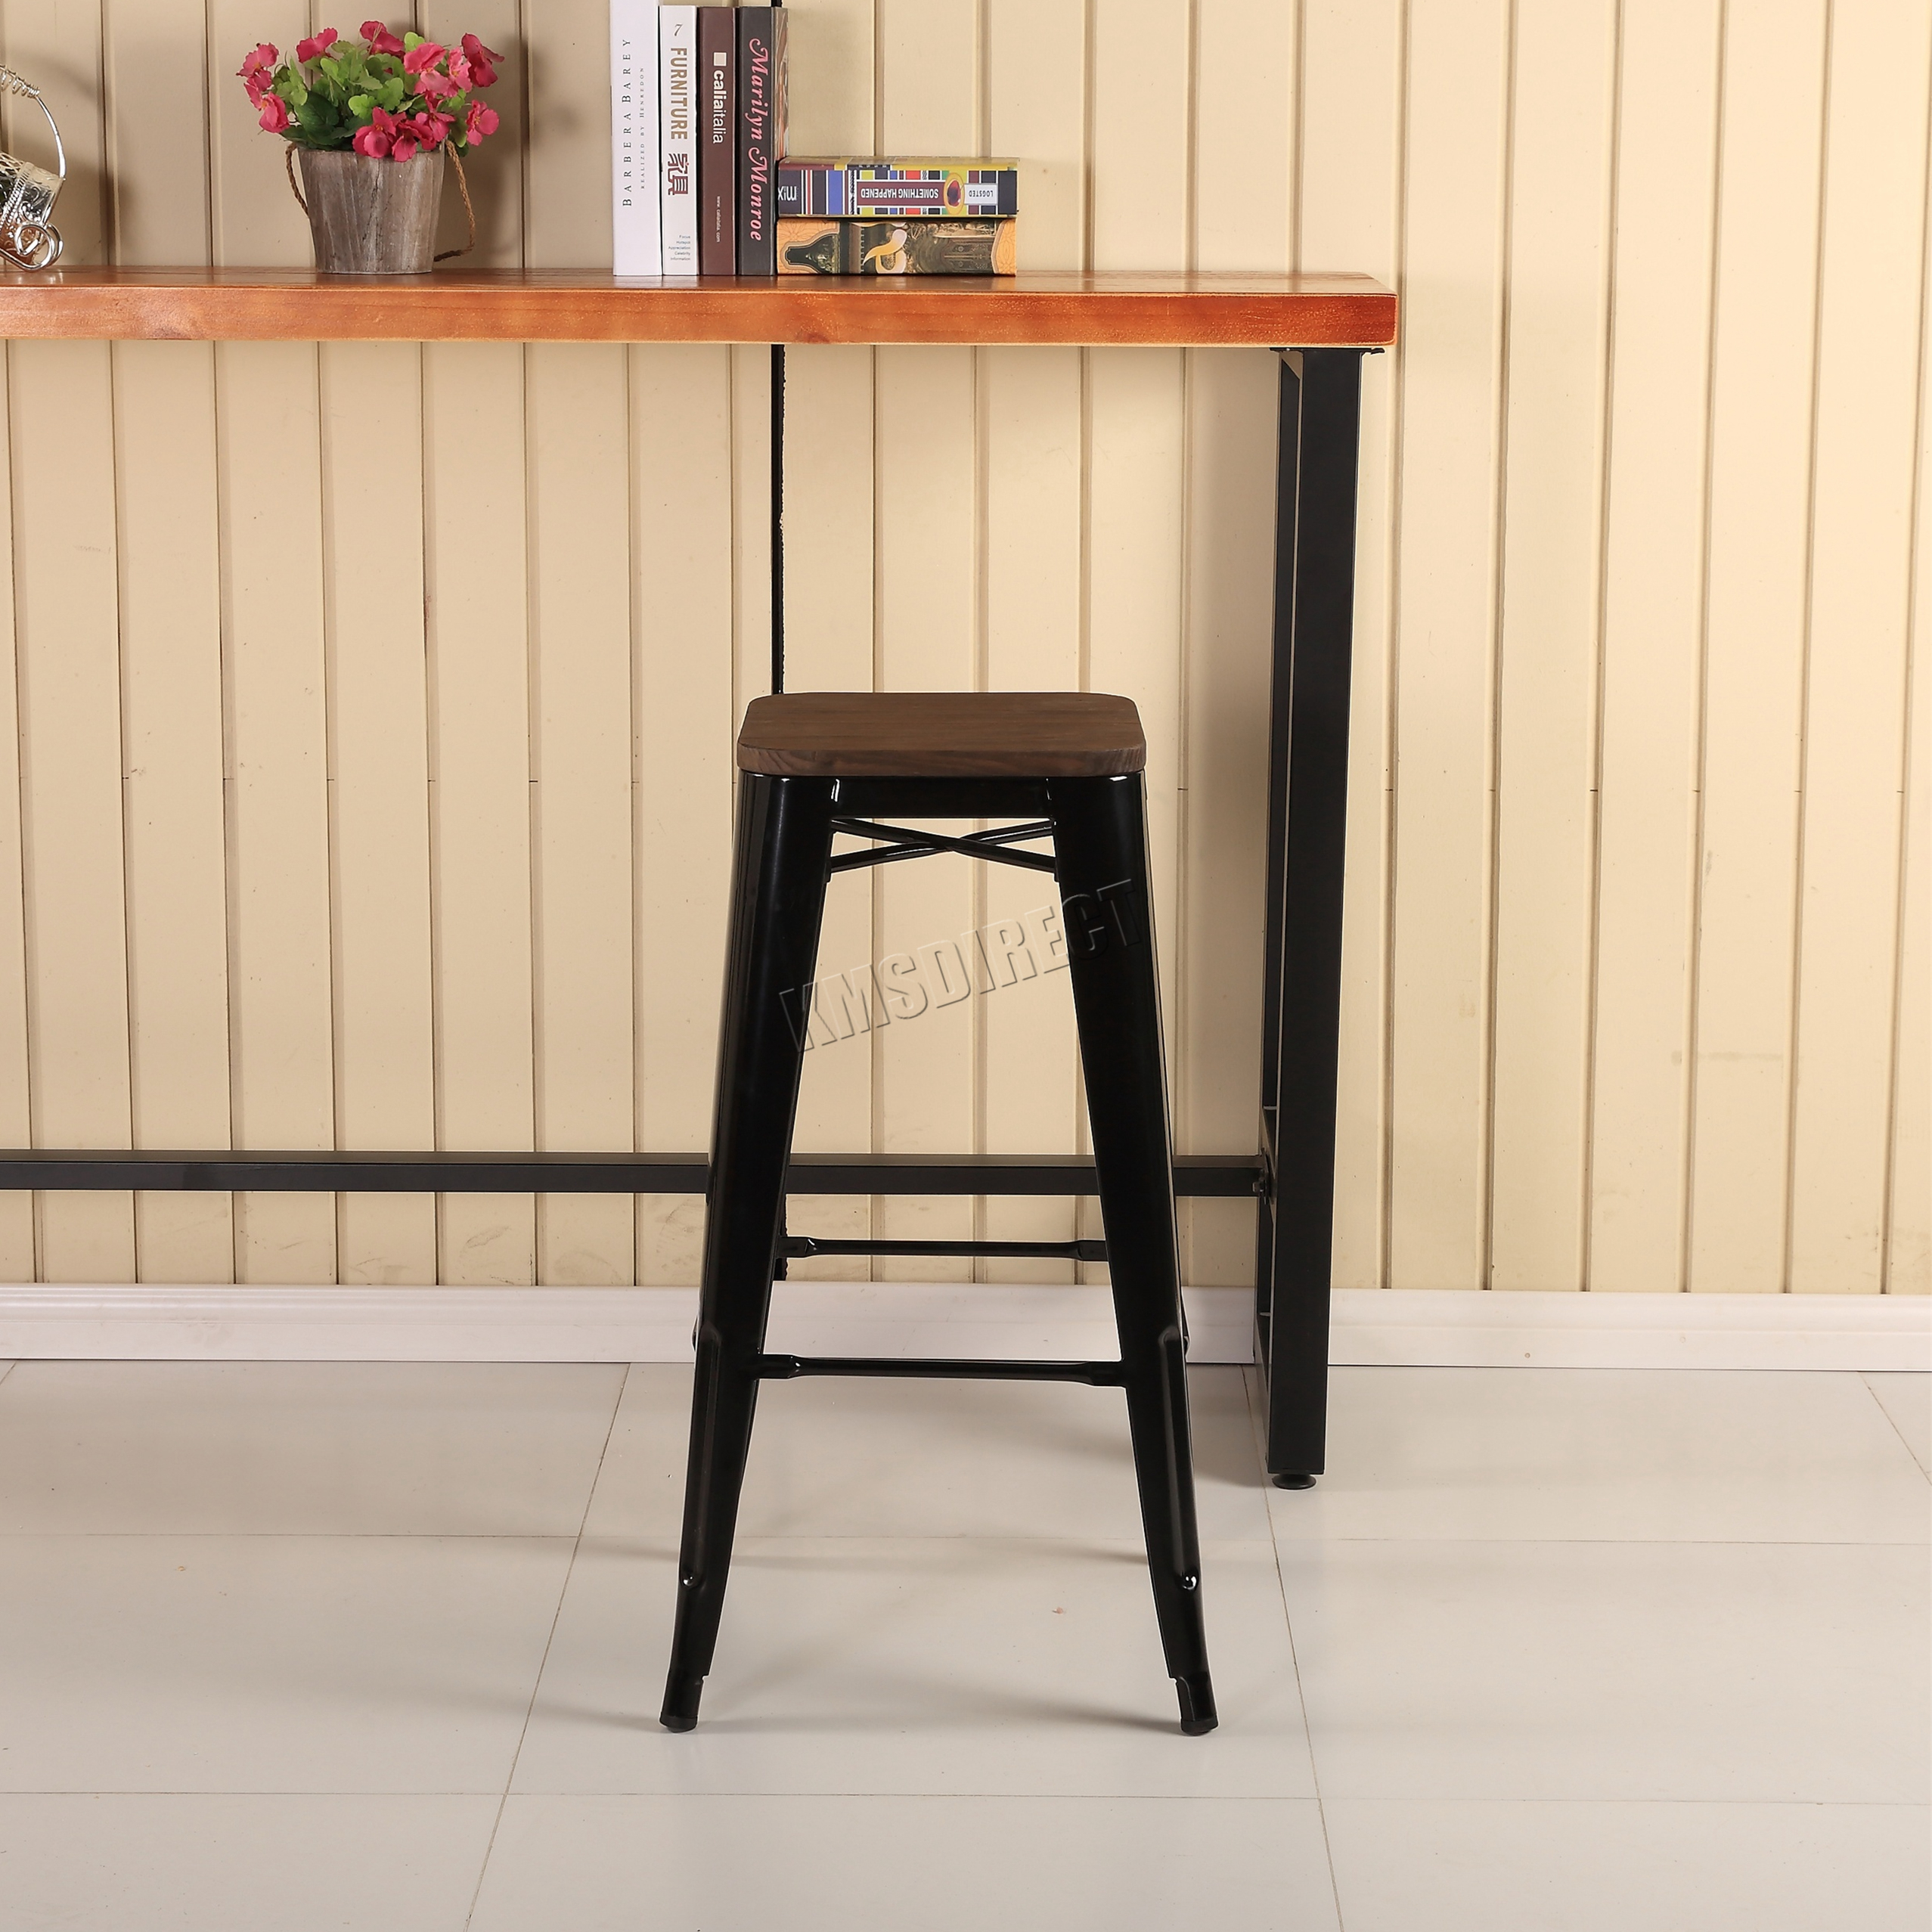 Foxhunter 2 4 metal tolix vintage barra comedor silla for Comedor con taburetes